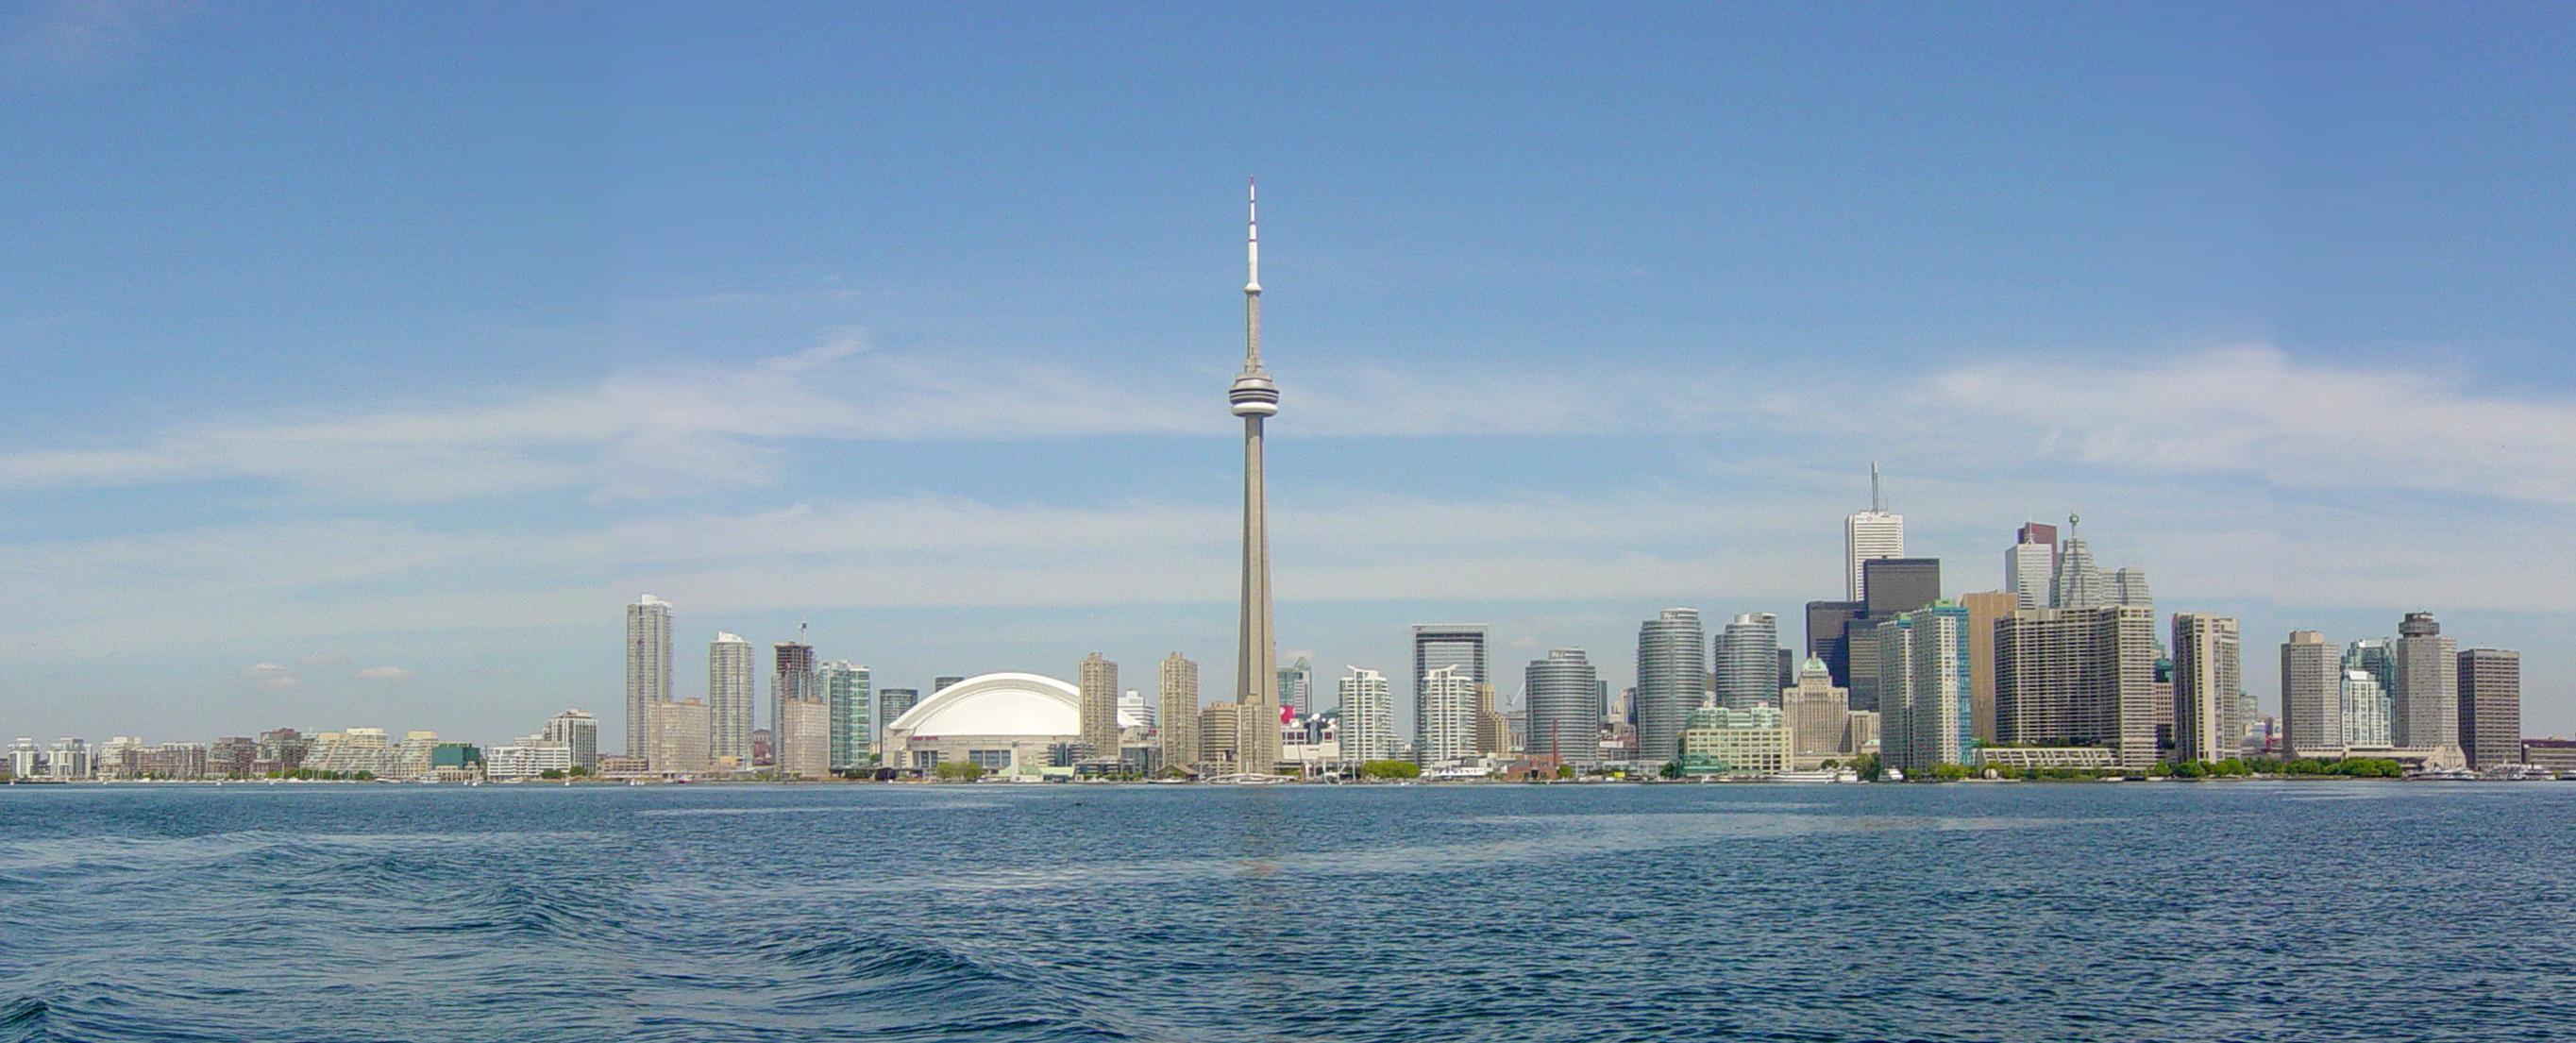 Toronto-Ontario, Canada, home of the NBA's Toronto Raptors at Jamaal Al-Din's Hoops 227!